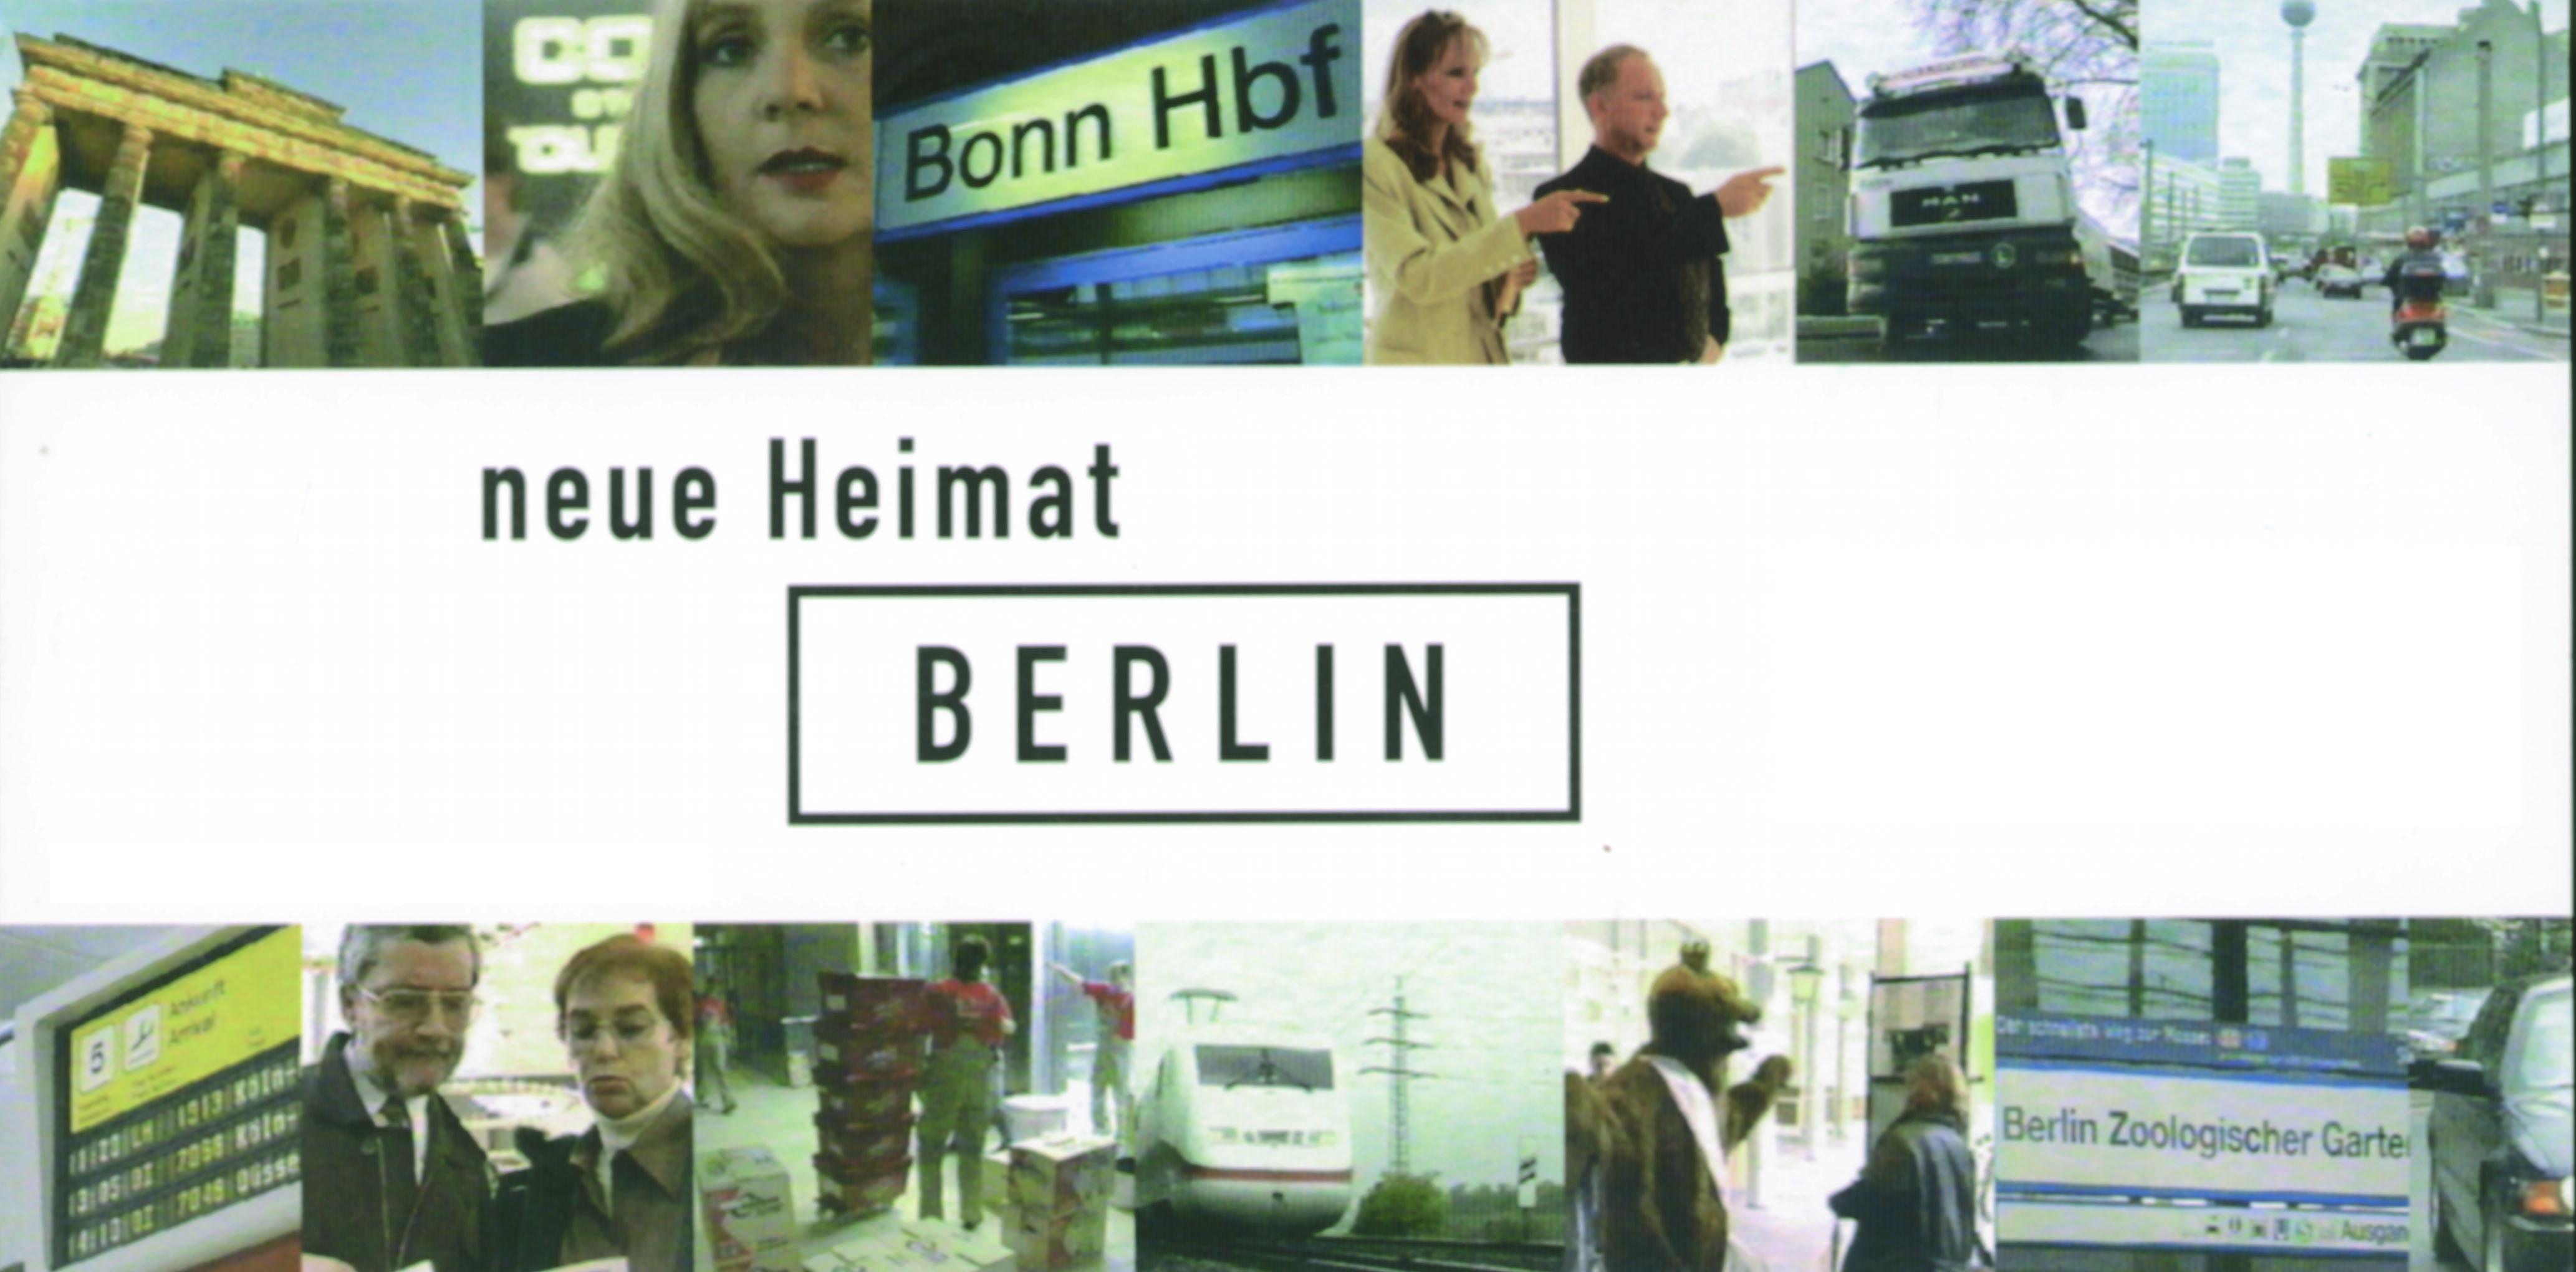 My New Hometown, Berlin